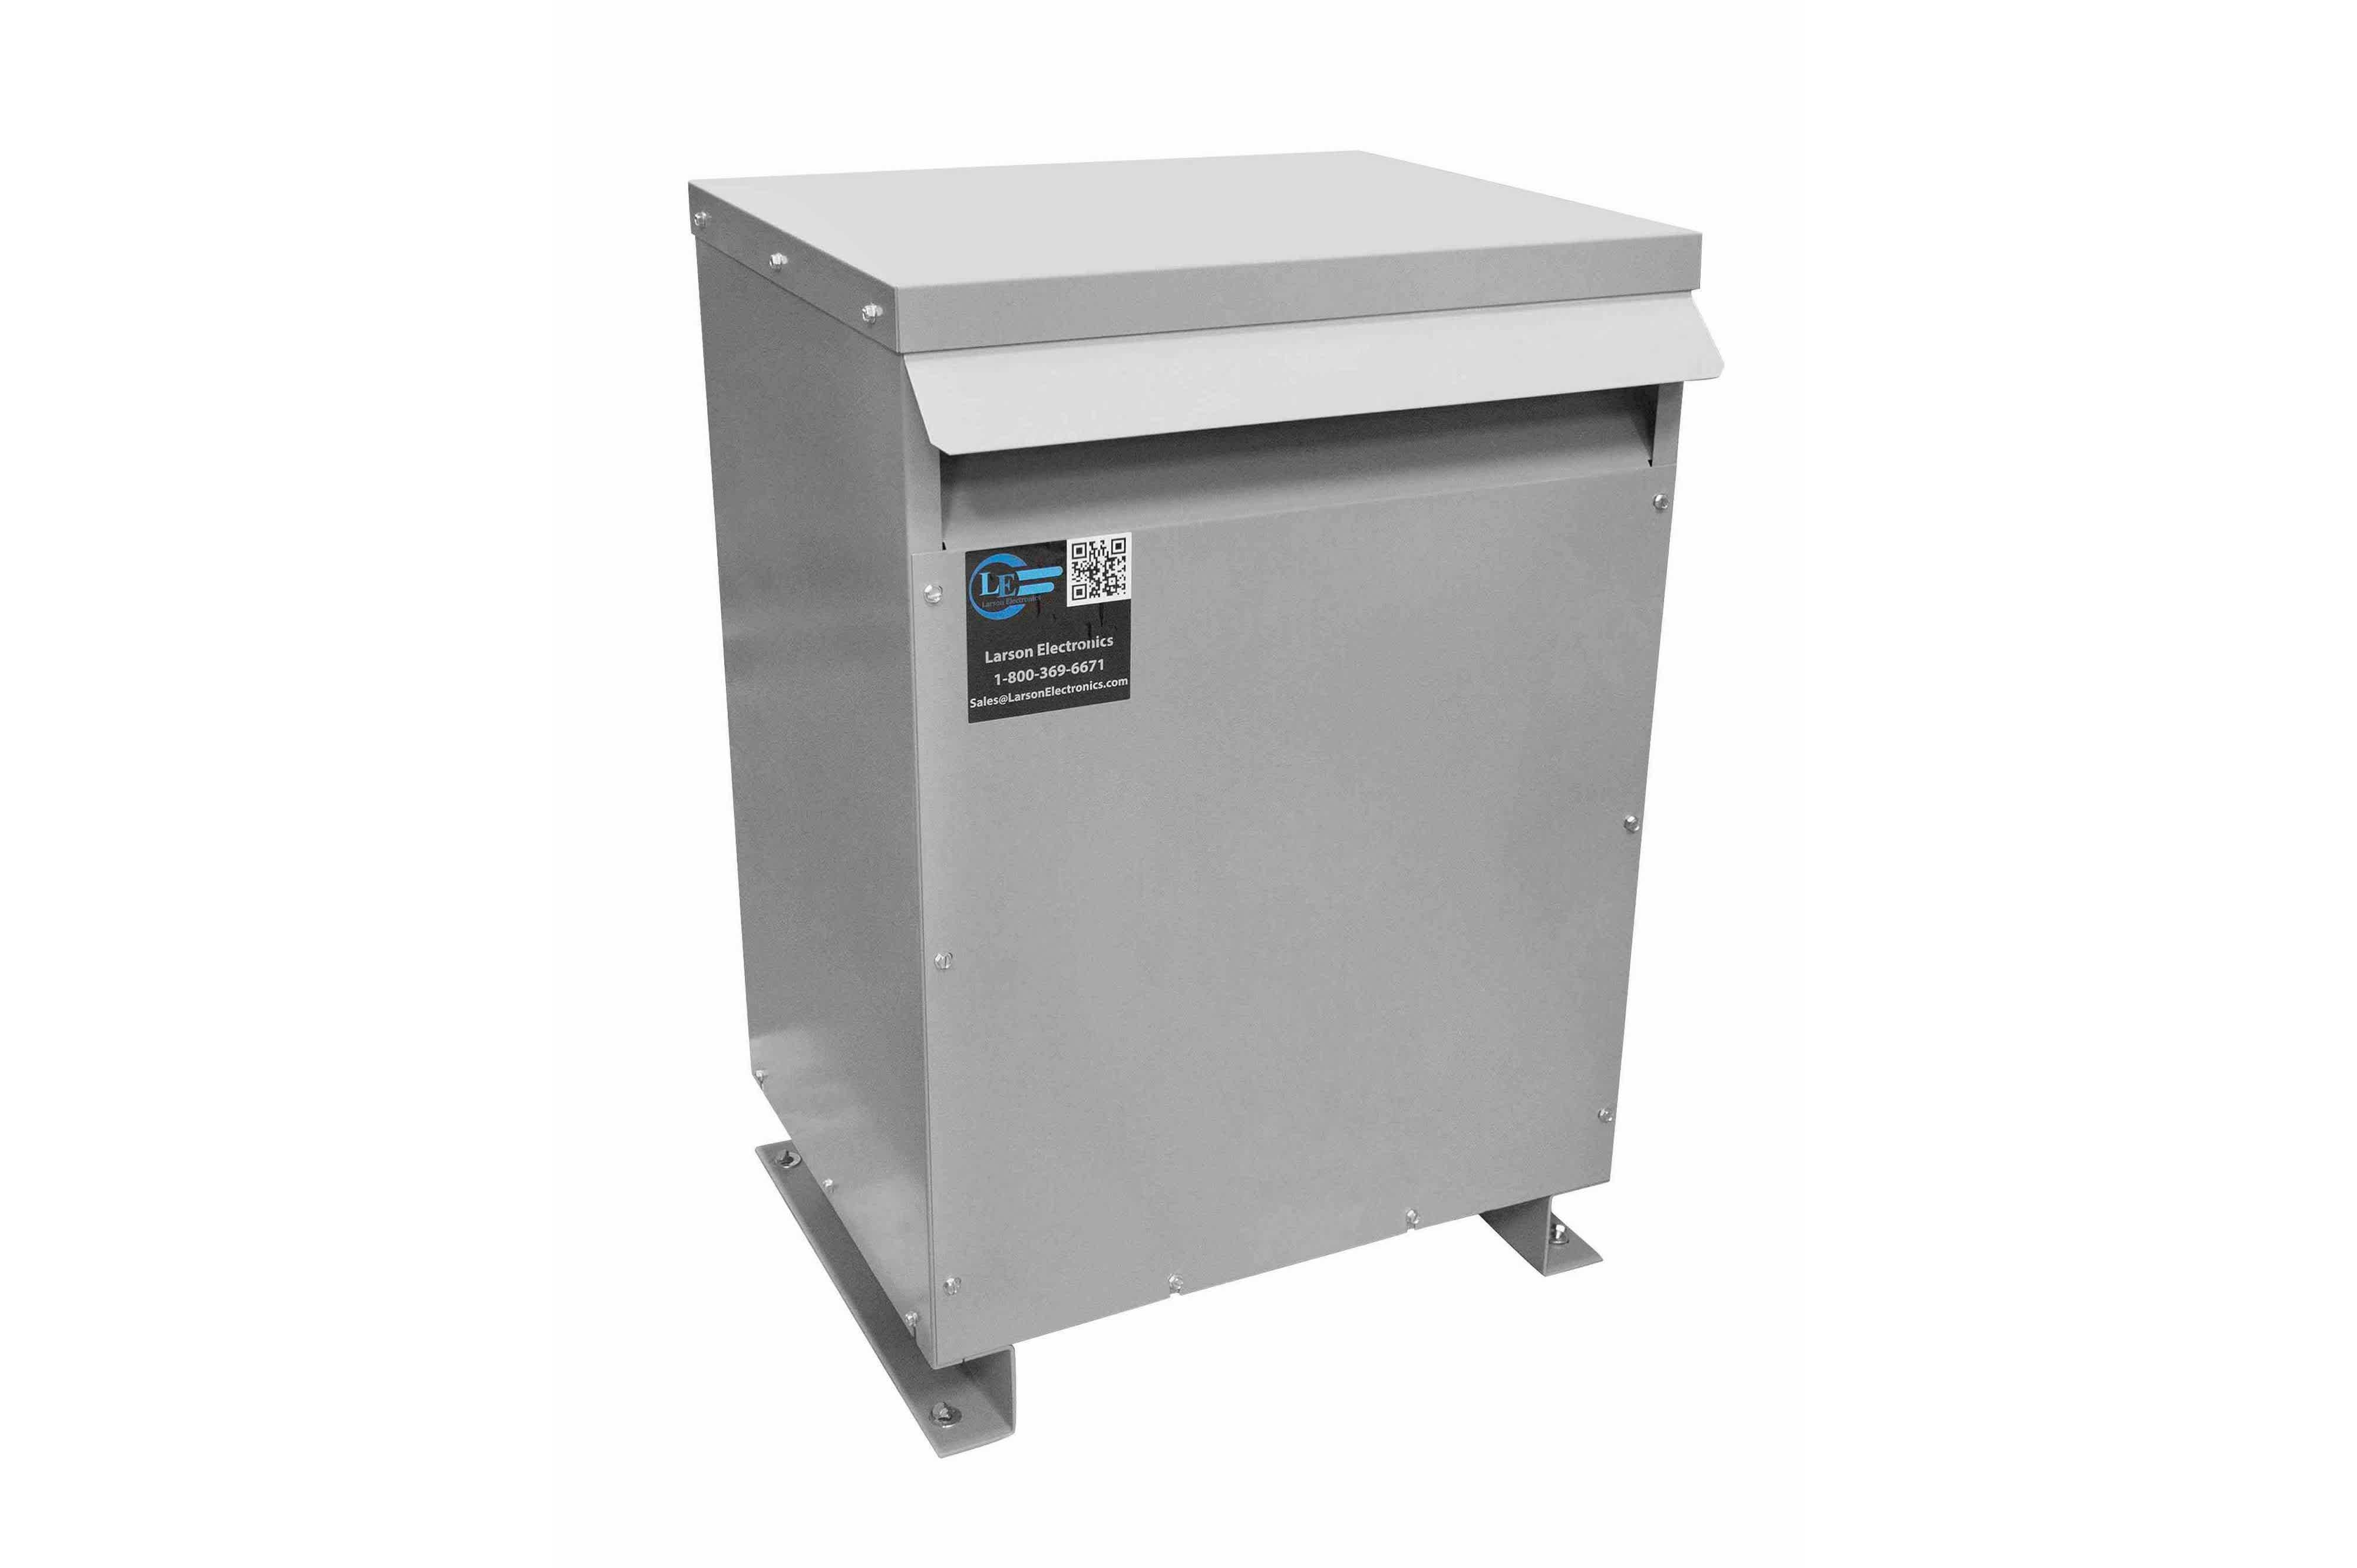 11 kVA 3PH Isolation Transformer, 240V Wye Primary, 380V Delta Secondary, N3R, Ventilated, 60 Hz